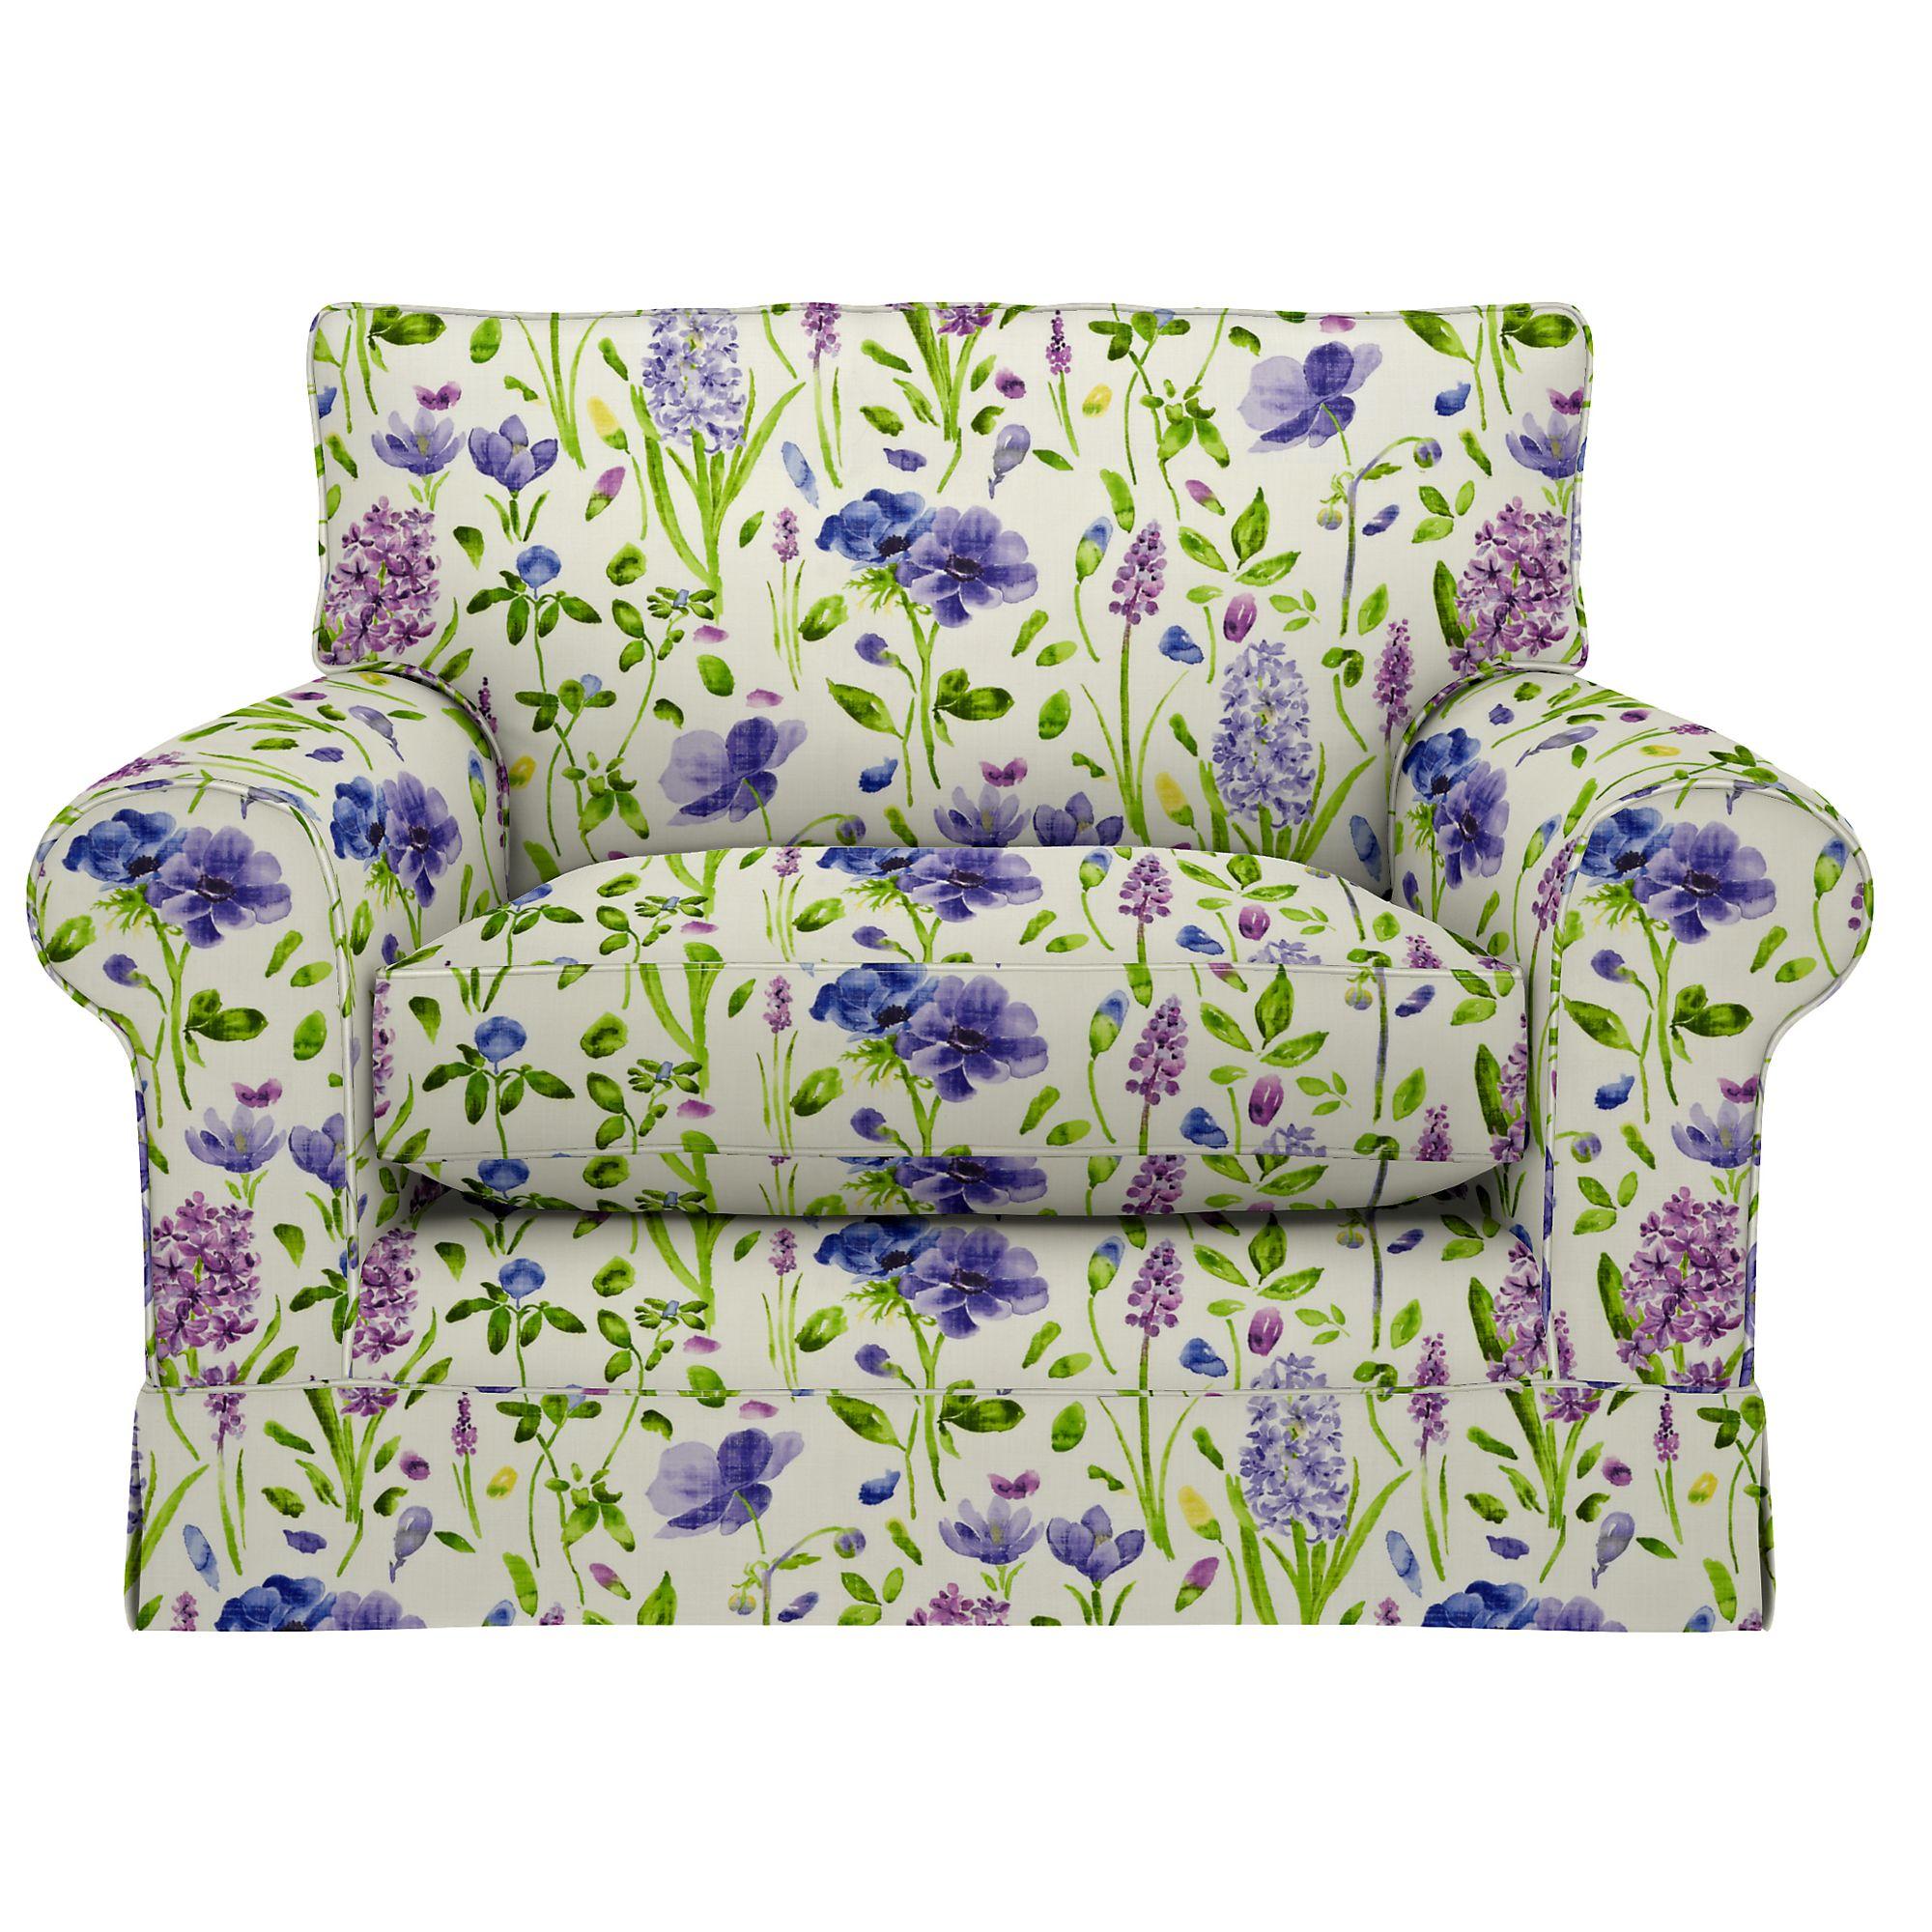 John Lewis Padstow Snuggler, Price Band E, Spring Flowers Hyacinth